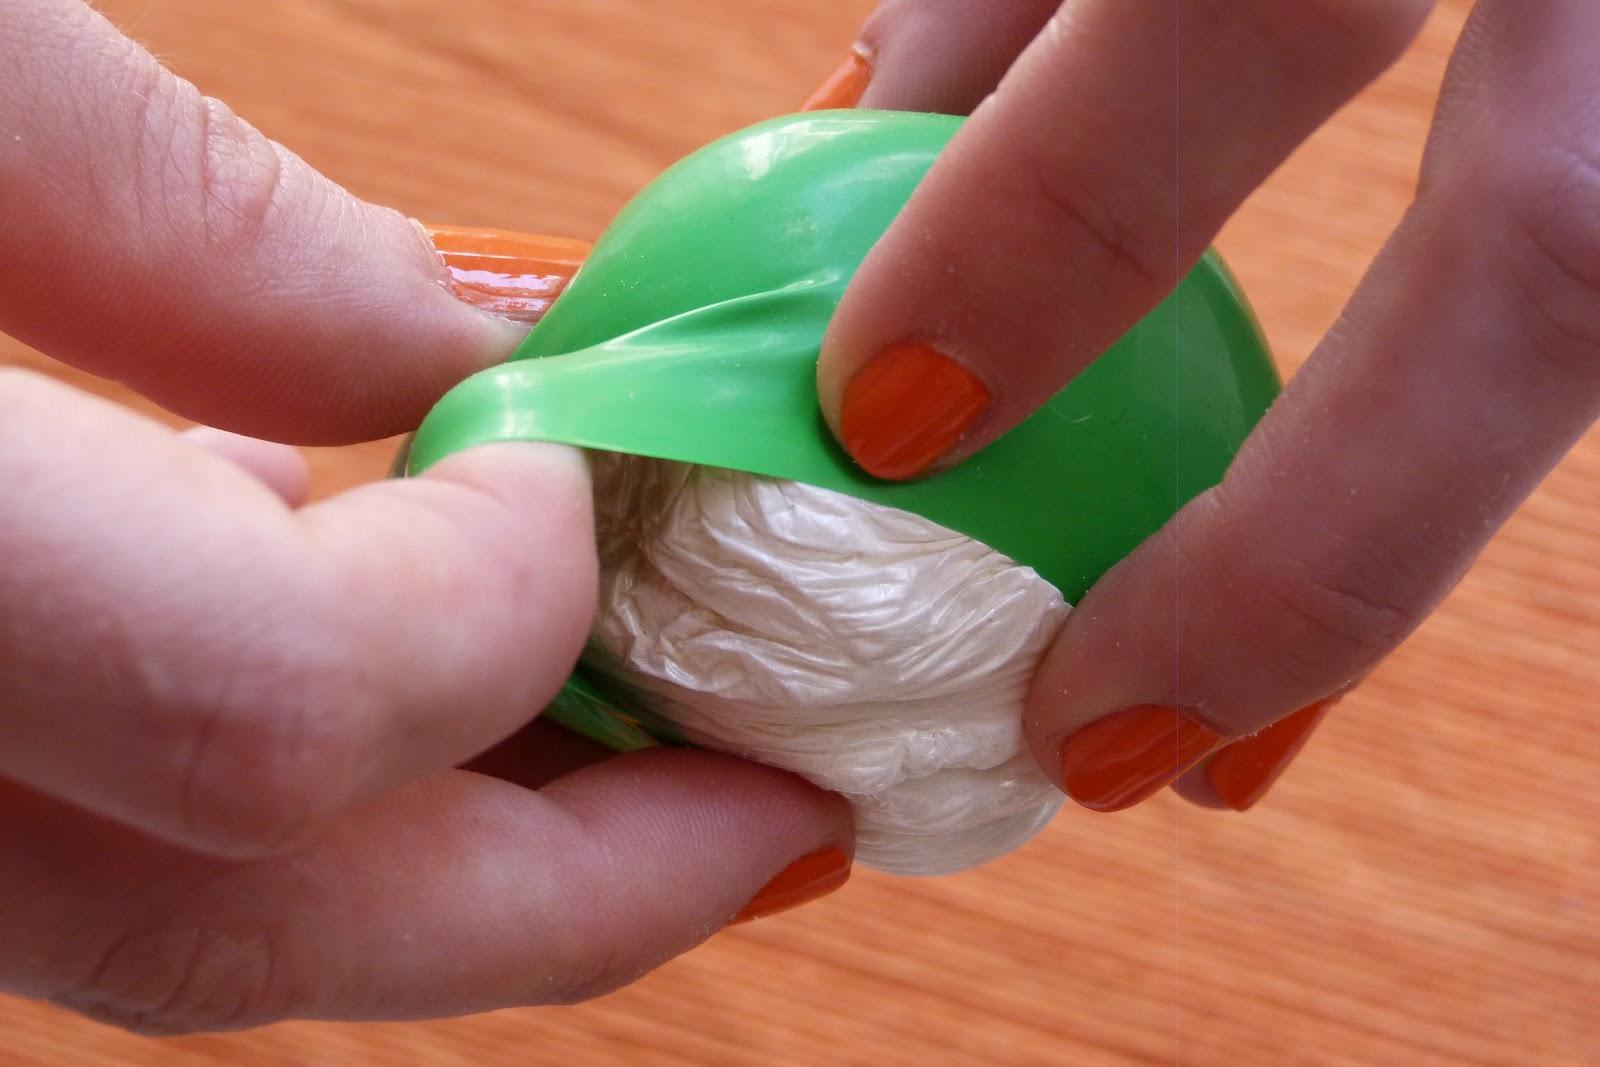 Bilder Zu Anti Stress Ball Selber Machen